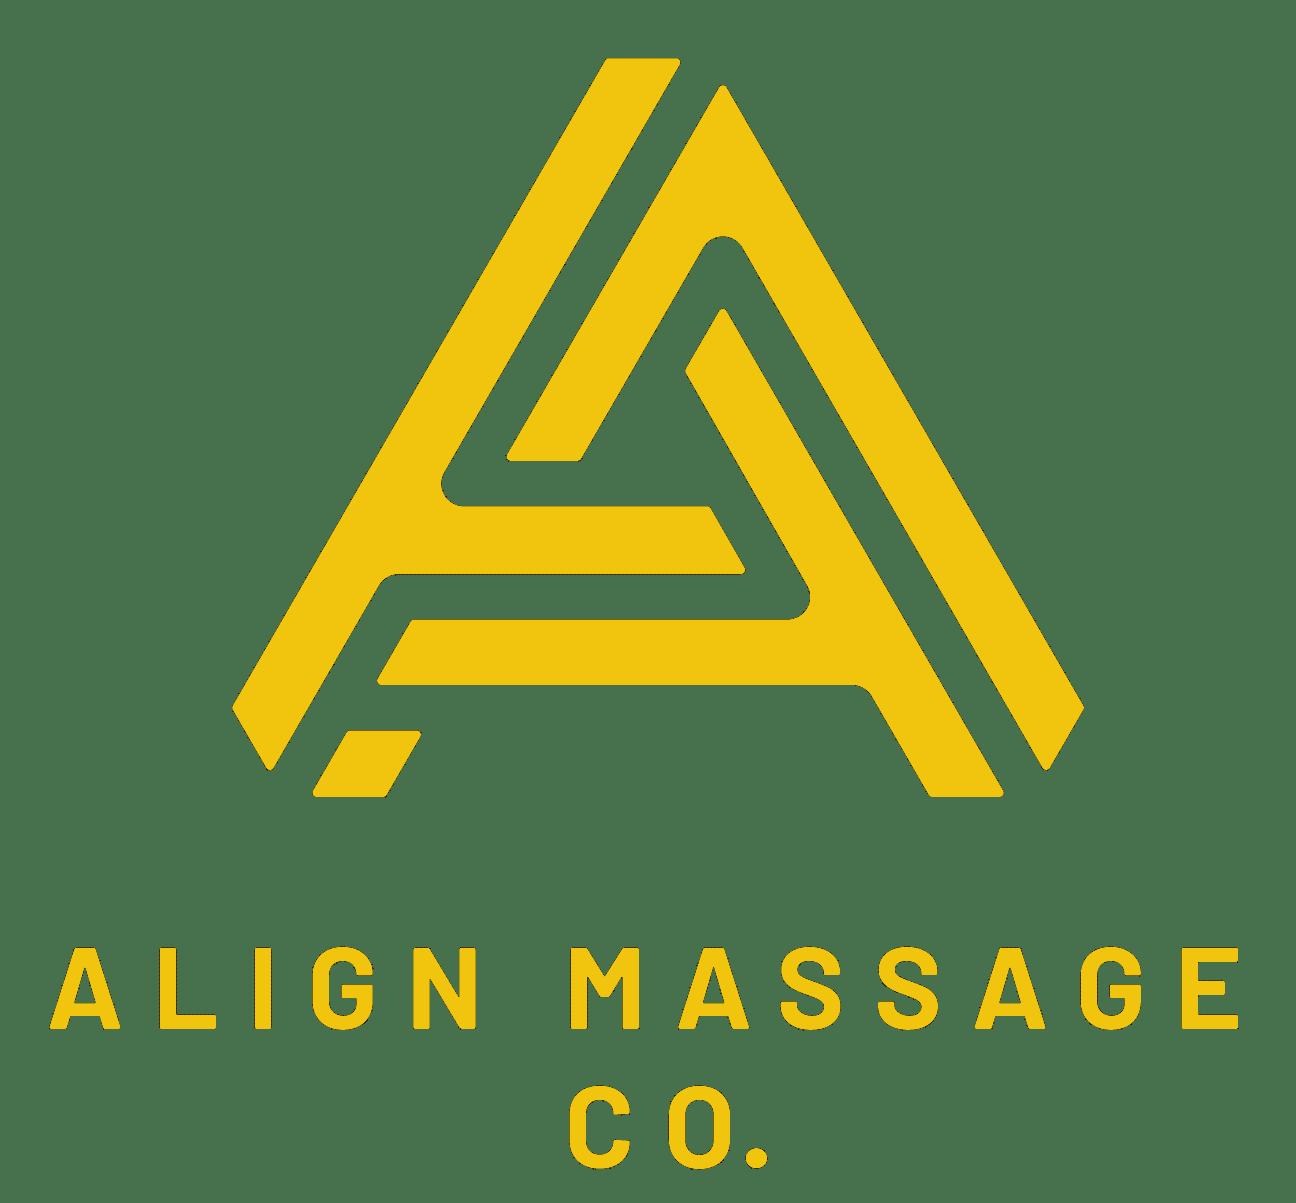 Align Massage Co